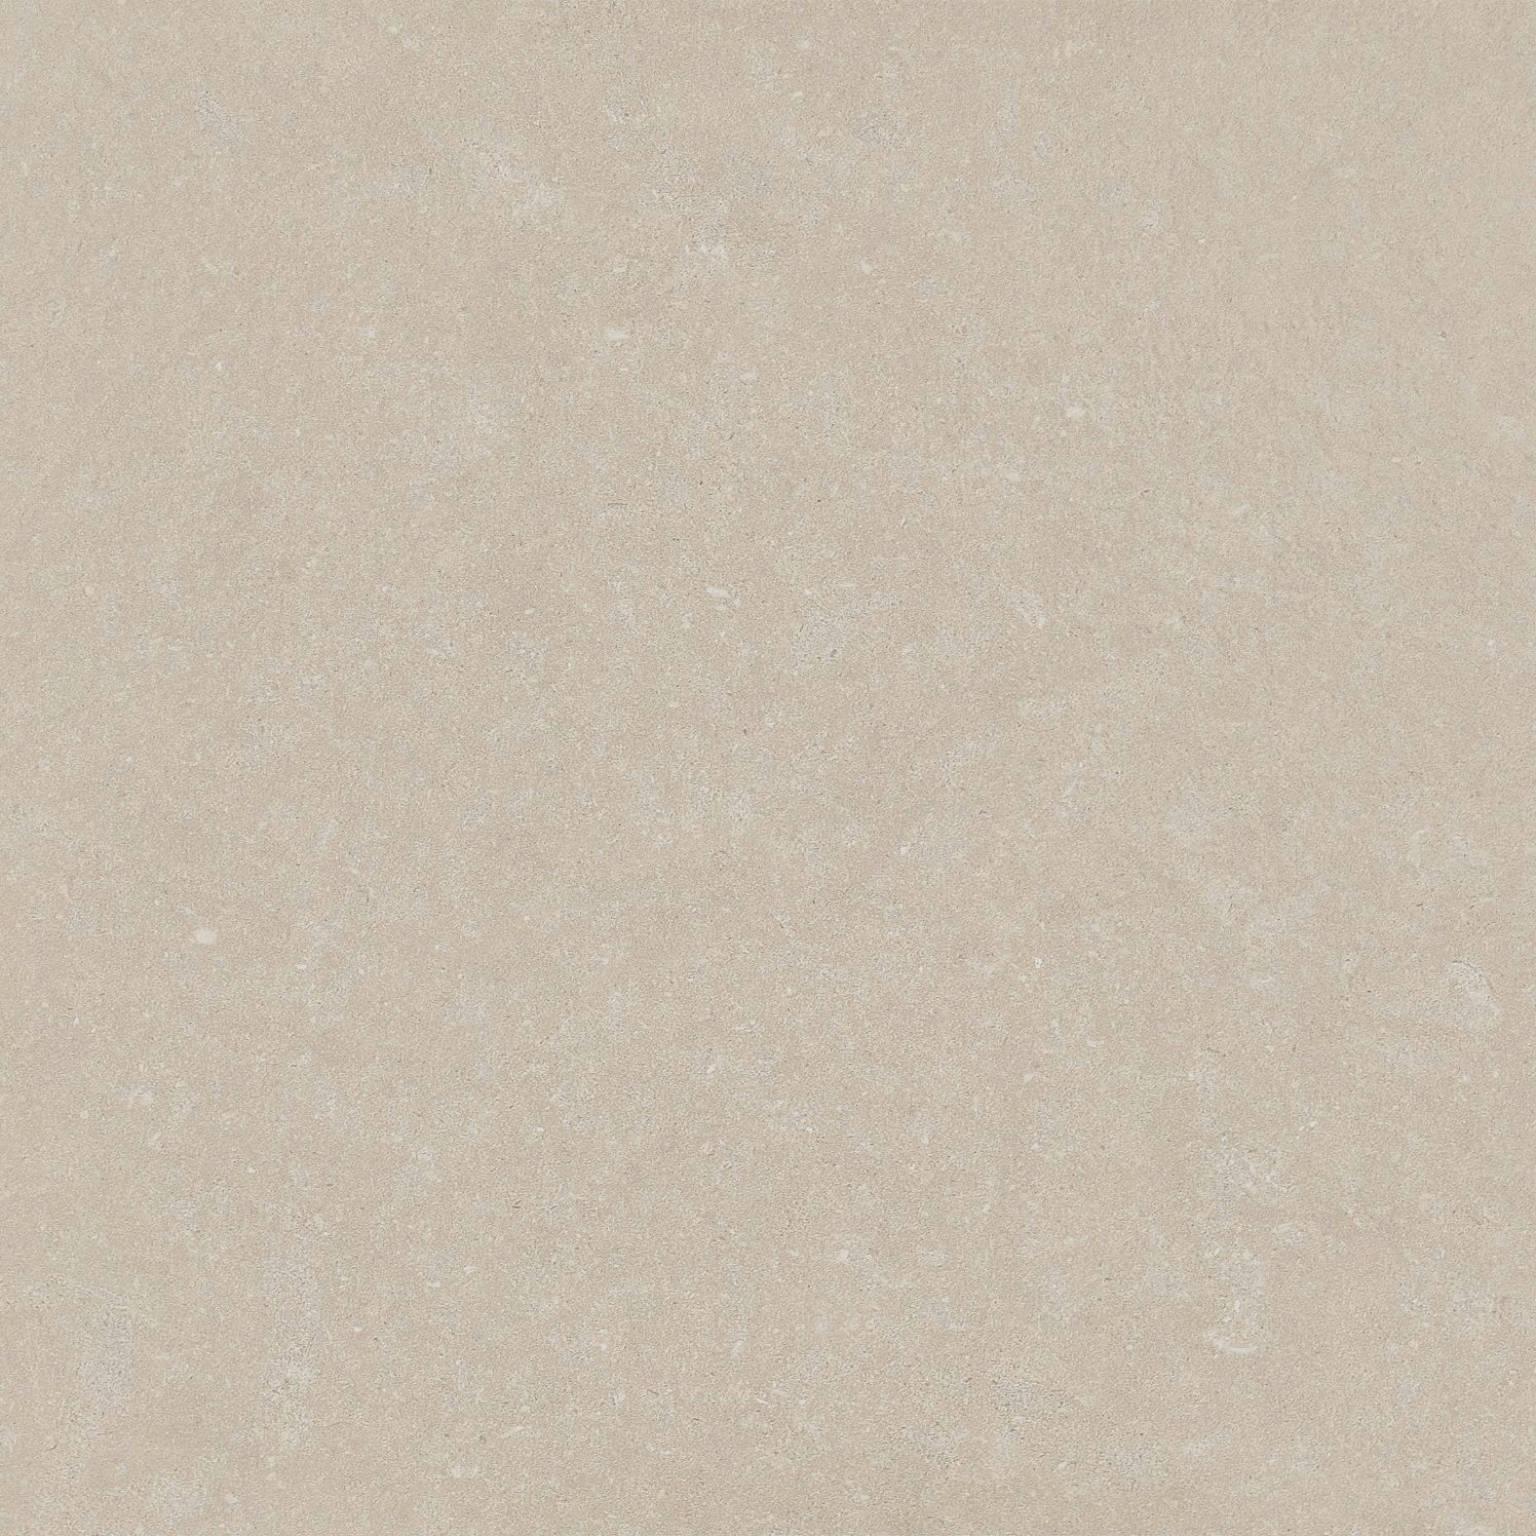 Qstone Sand 60x60   Newker